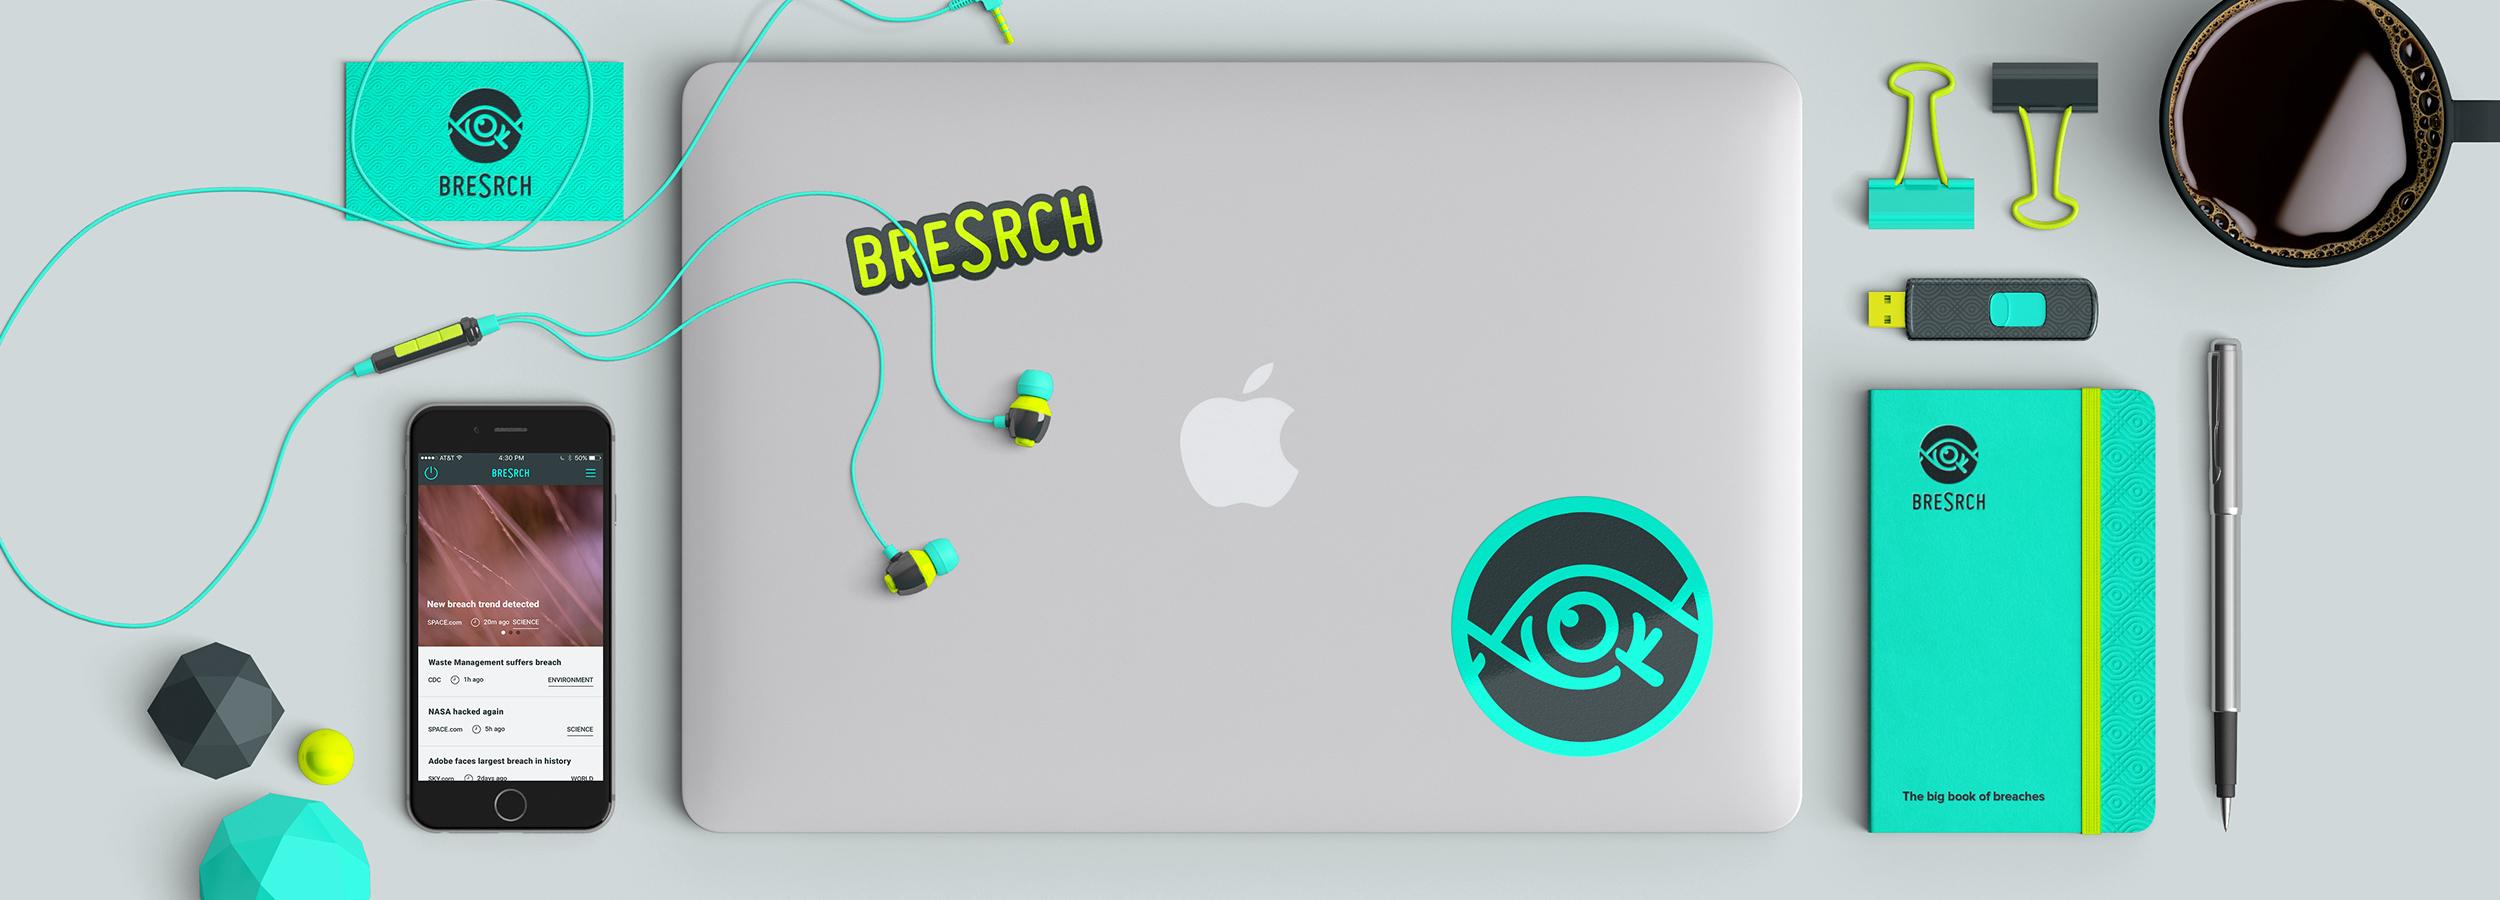 breSrch – Digital security breaches database app branding